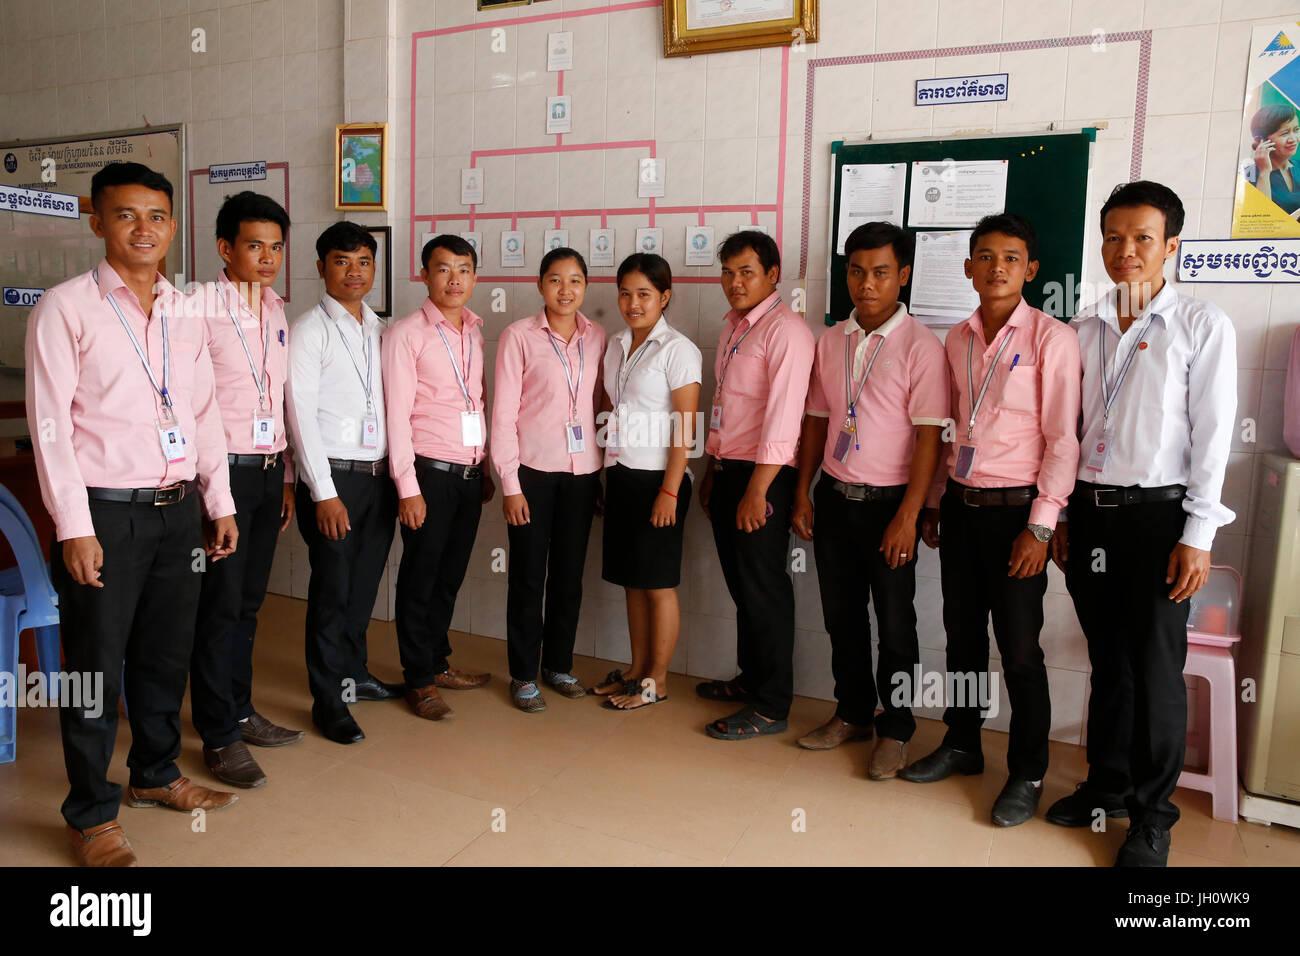 Chamroeun Microfinance Battambang Branch Office-Team. Kambodscha. Stockbild